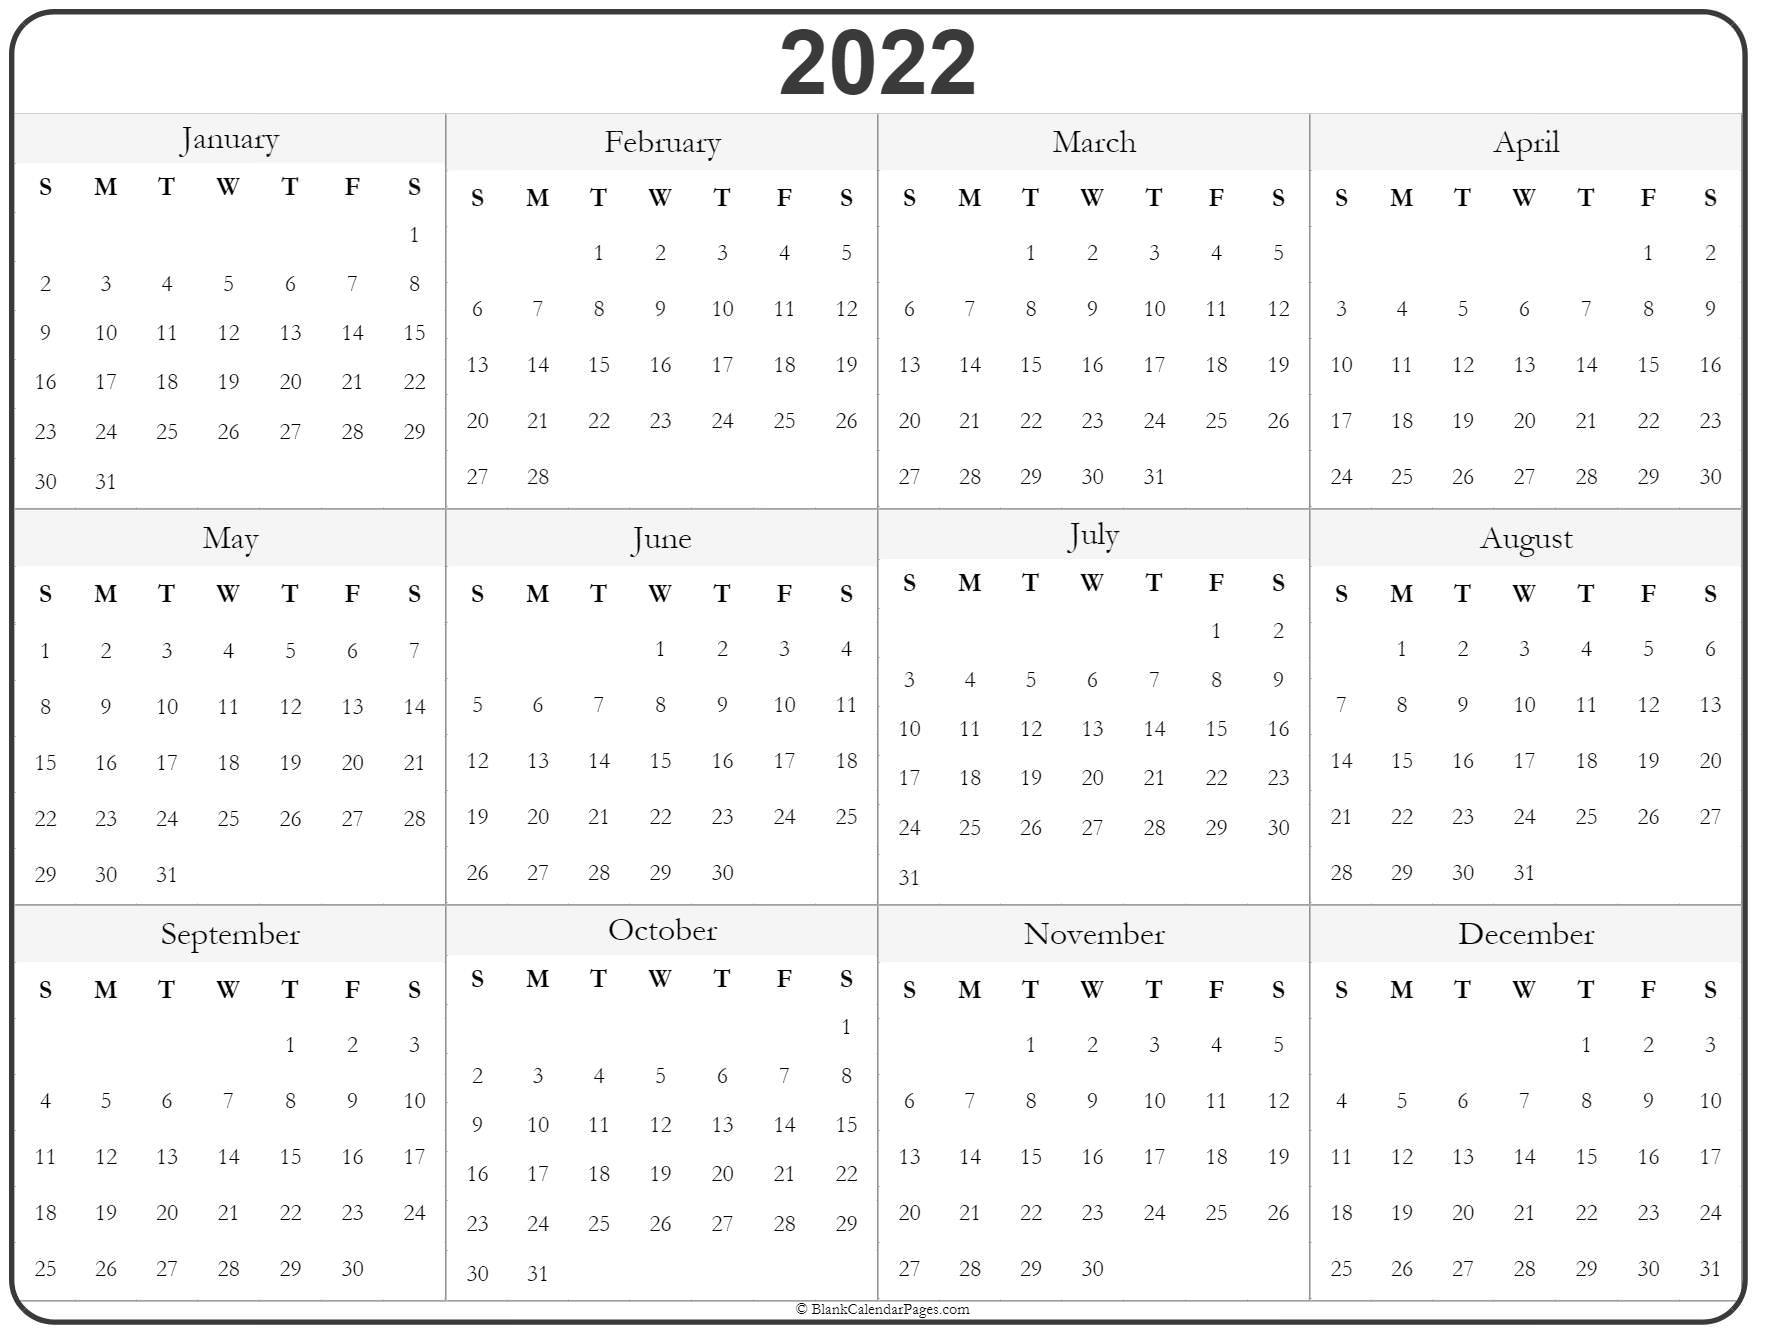 free printable 2022 monthly printable calendar. 2022 year calendar | yearly printable